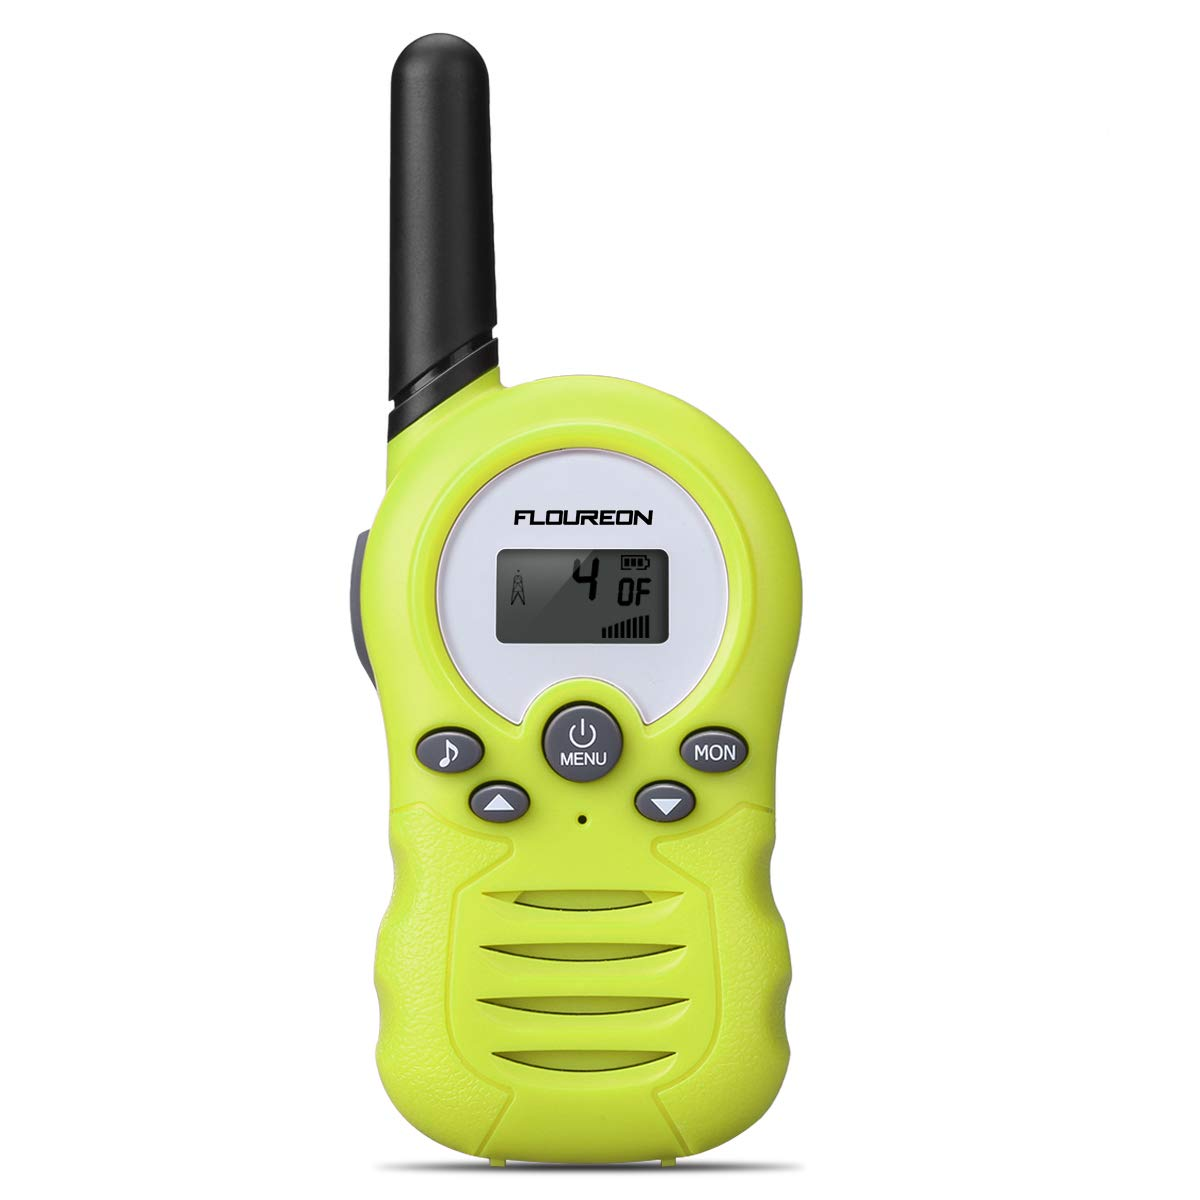 Kids Walkie Talkies FLOUREON Two Way Radios 22 Channel 3000M (MAX 5000M Open Field) UHF Long Range Handheld Talkies Talky (Green)